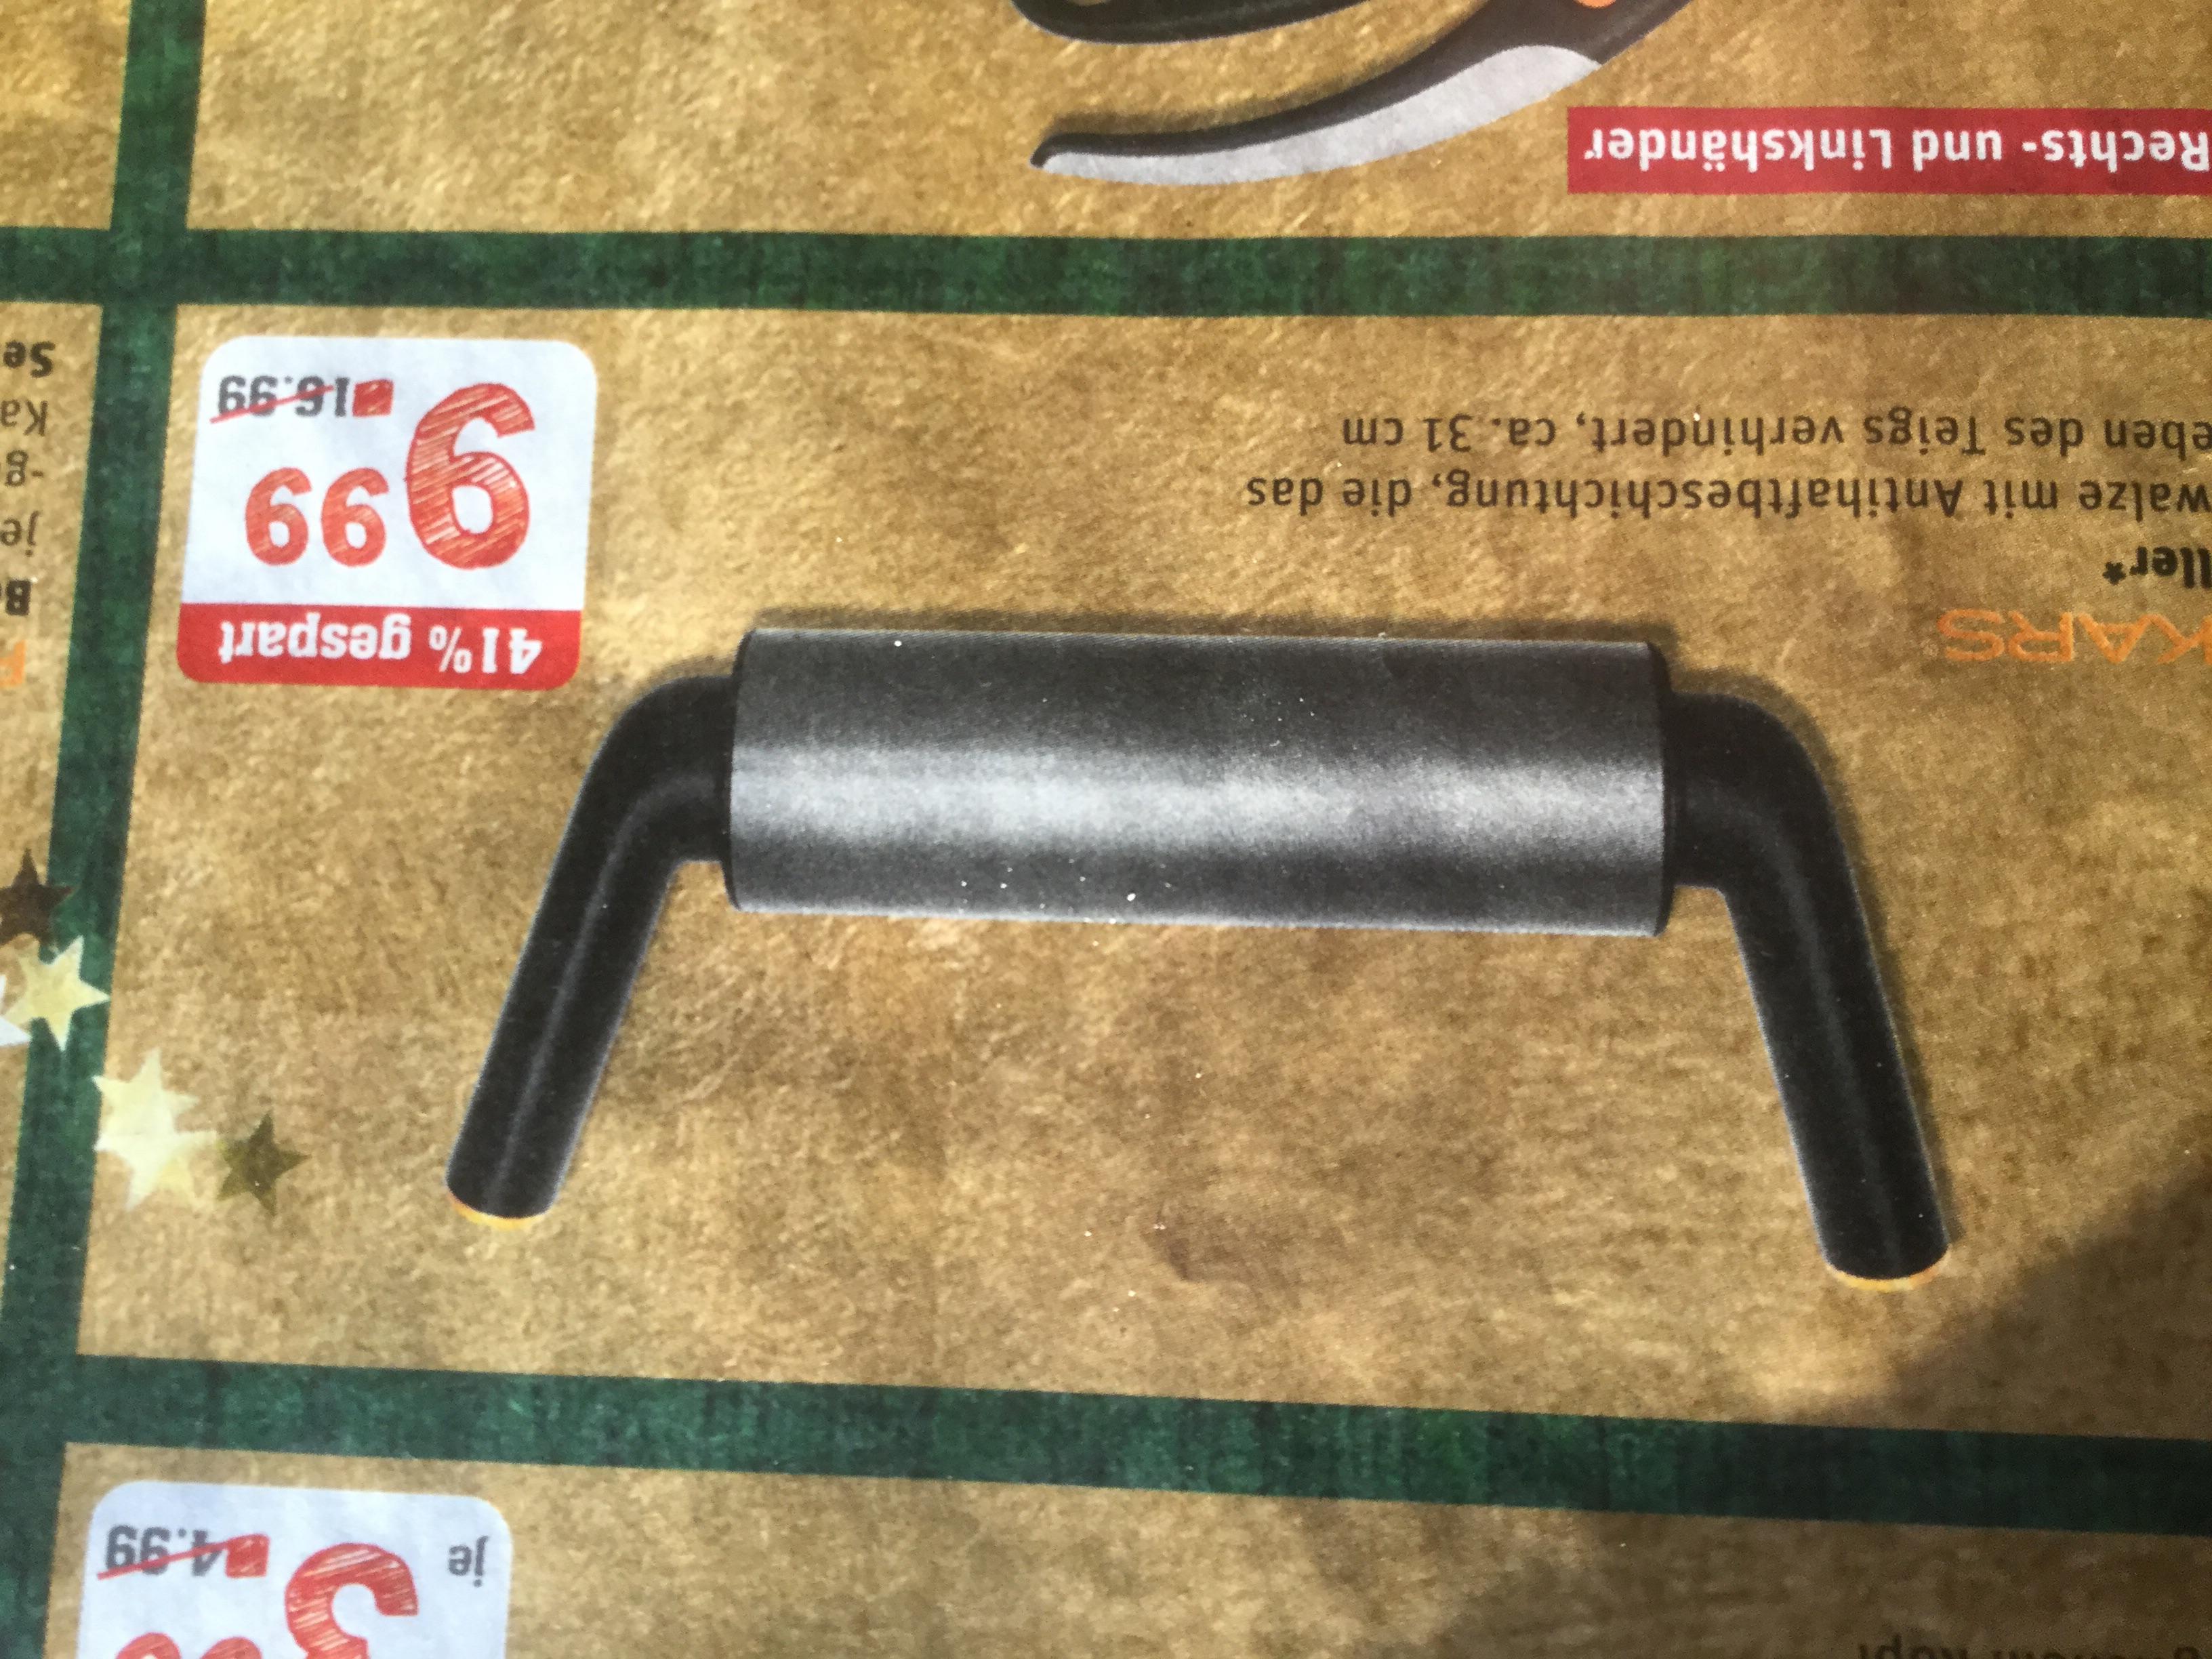 [HH] Fiskars Teigroller - 9,99 € - Rewe City Altona - Max-Brauer-Allee